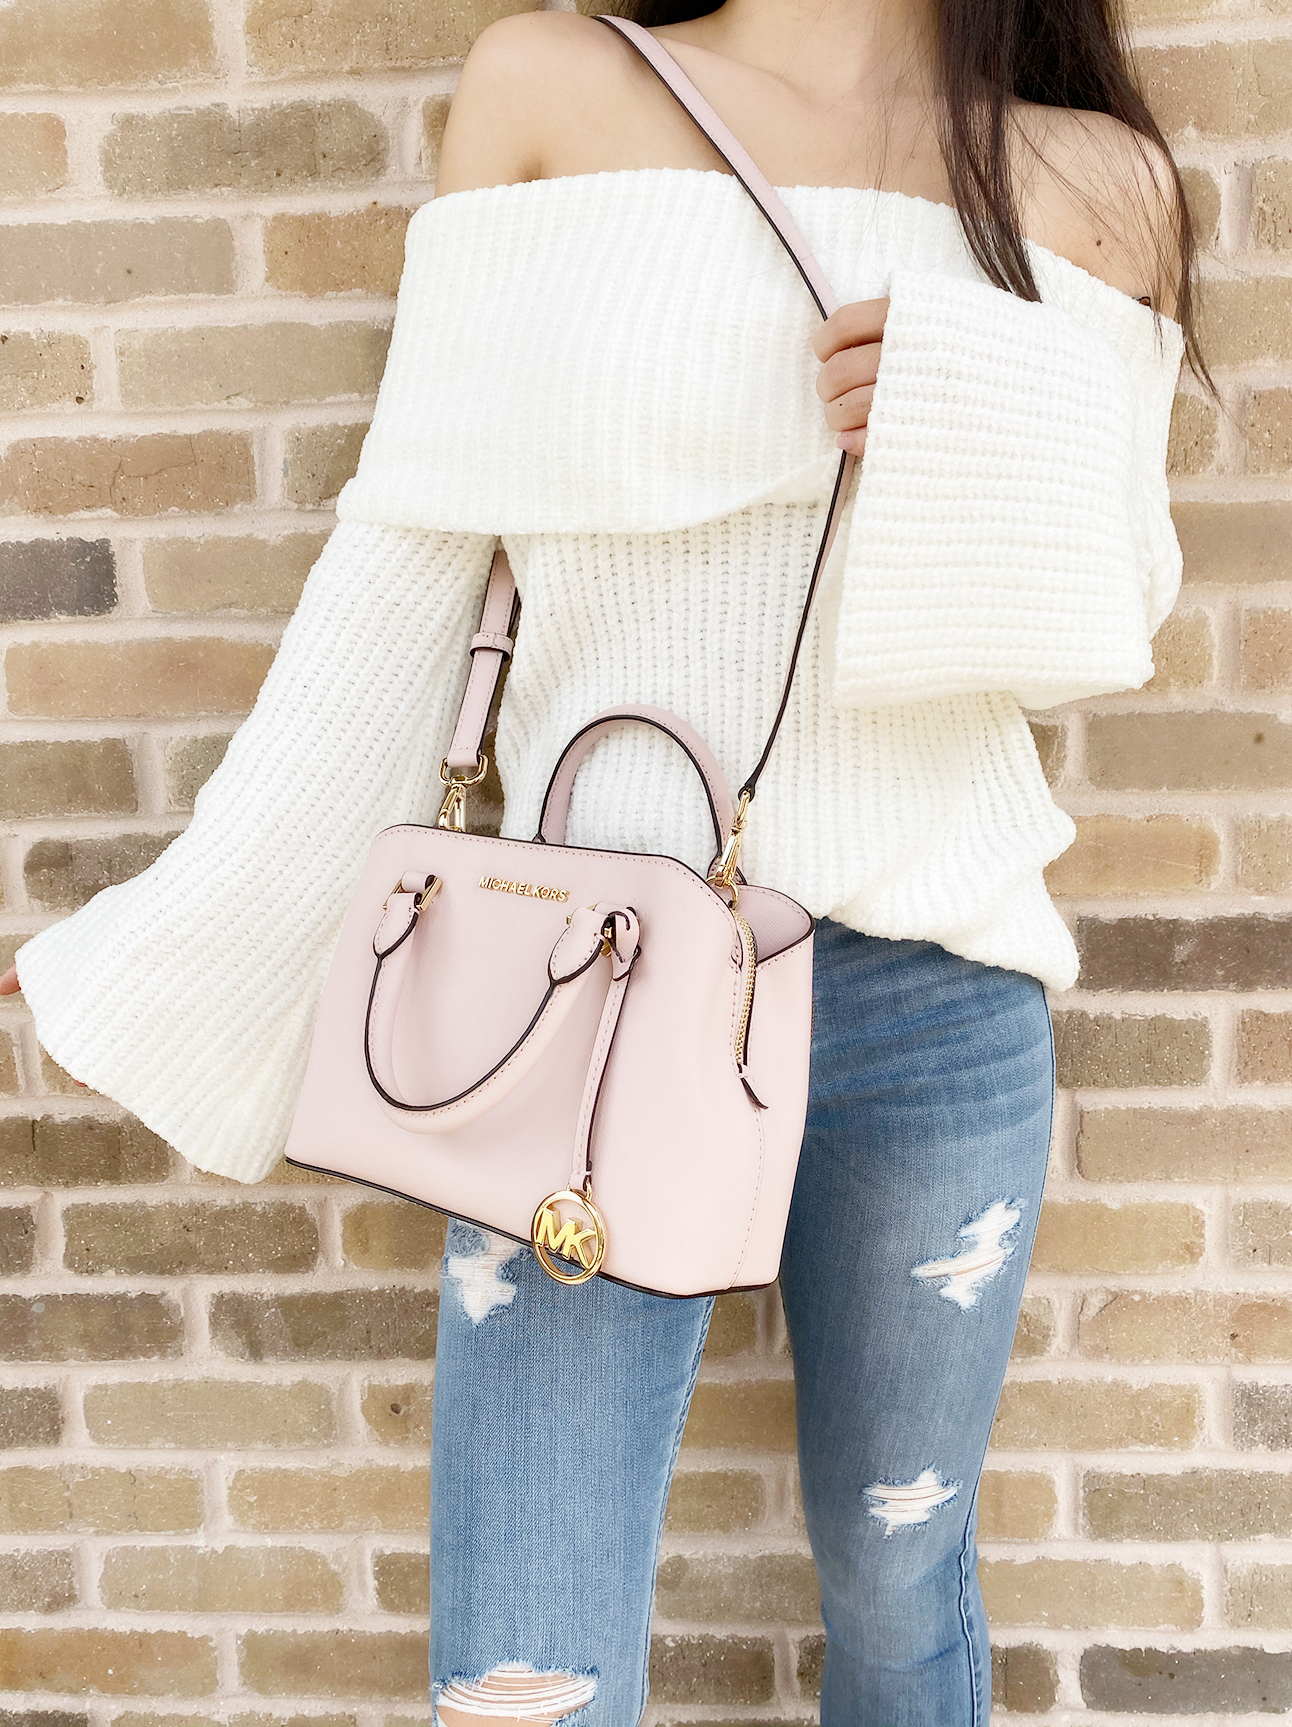 Details about Michael Kors Savannah Small Satchel Leather Crossbody Handbag Blossom